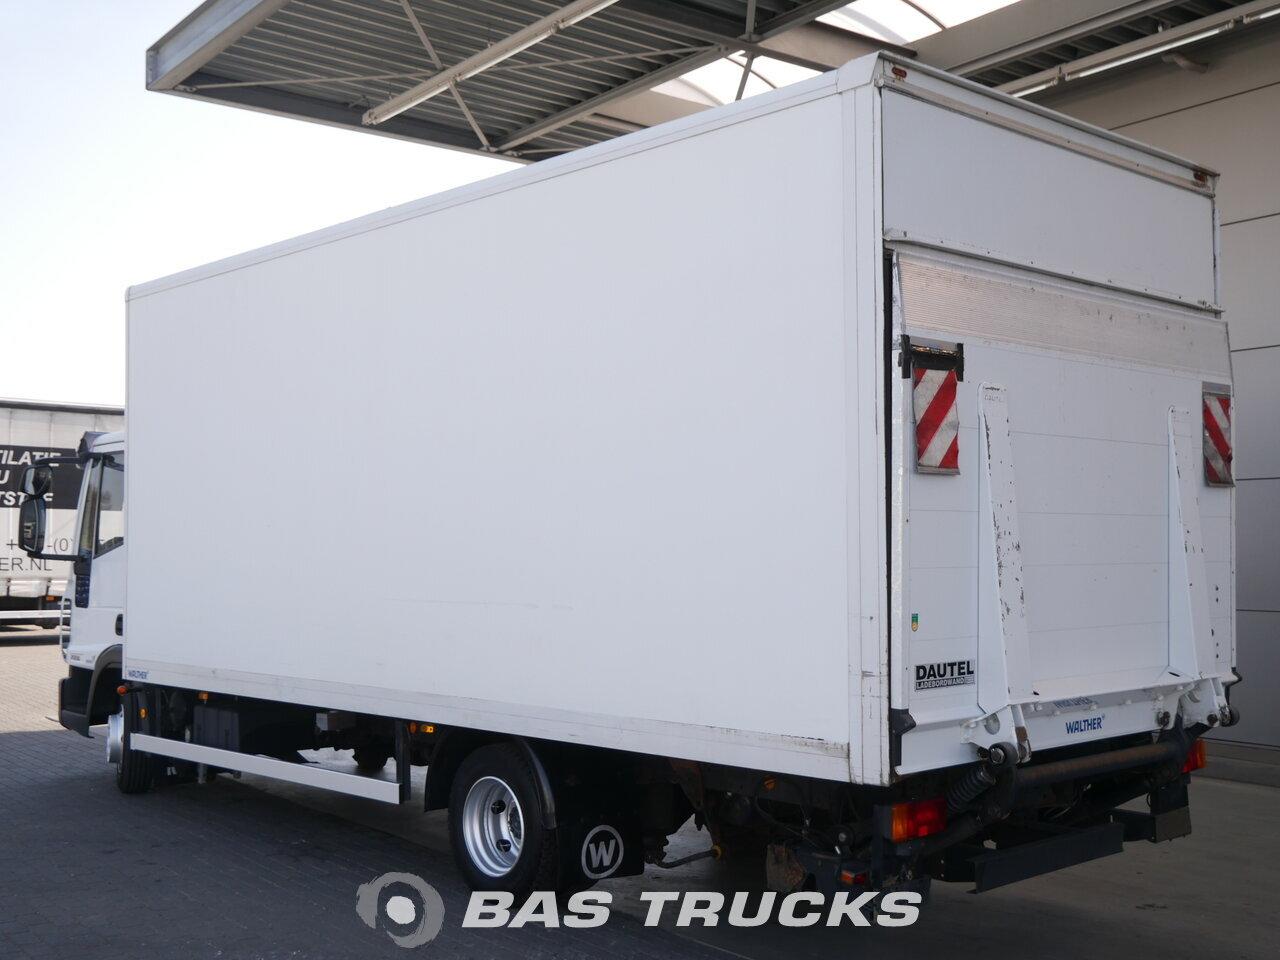 For sale at BAS Trucks: IVECO Eurocargo 75E16 4X2 11/2007